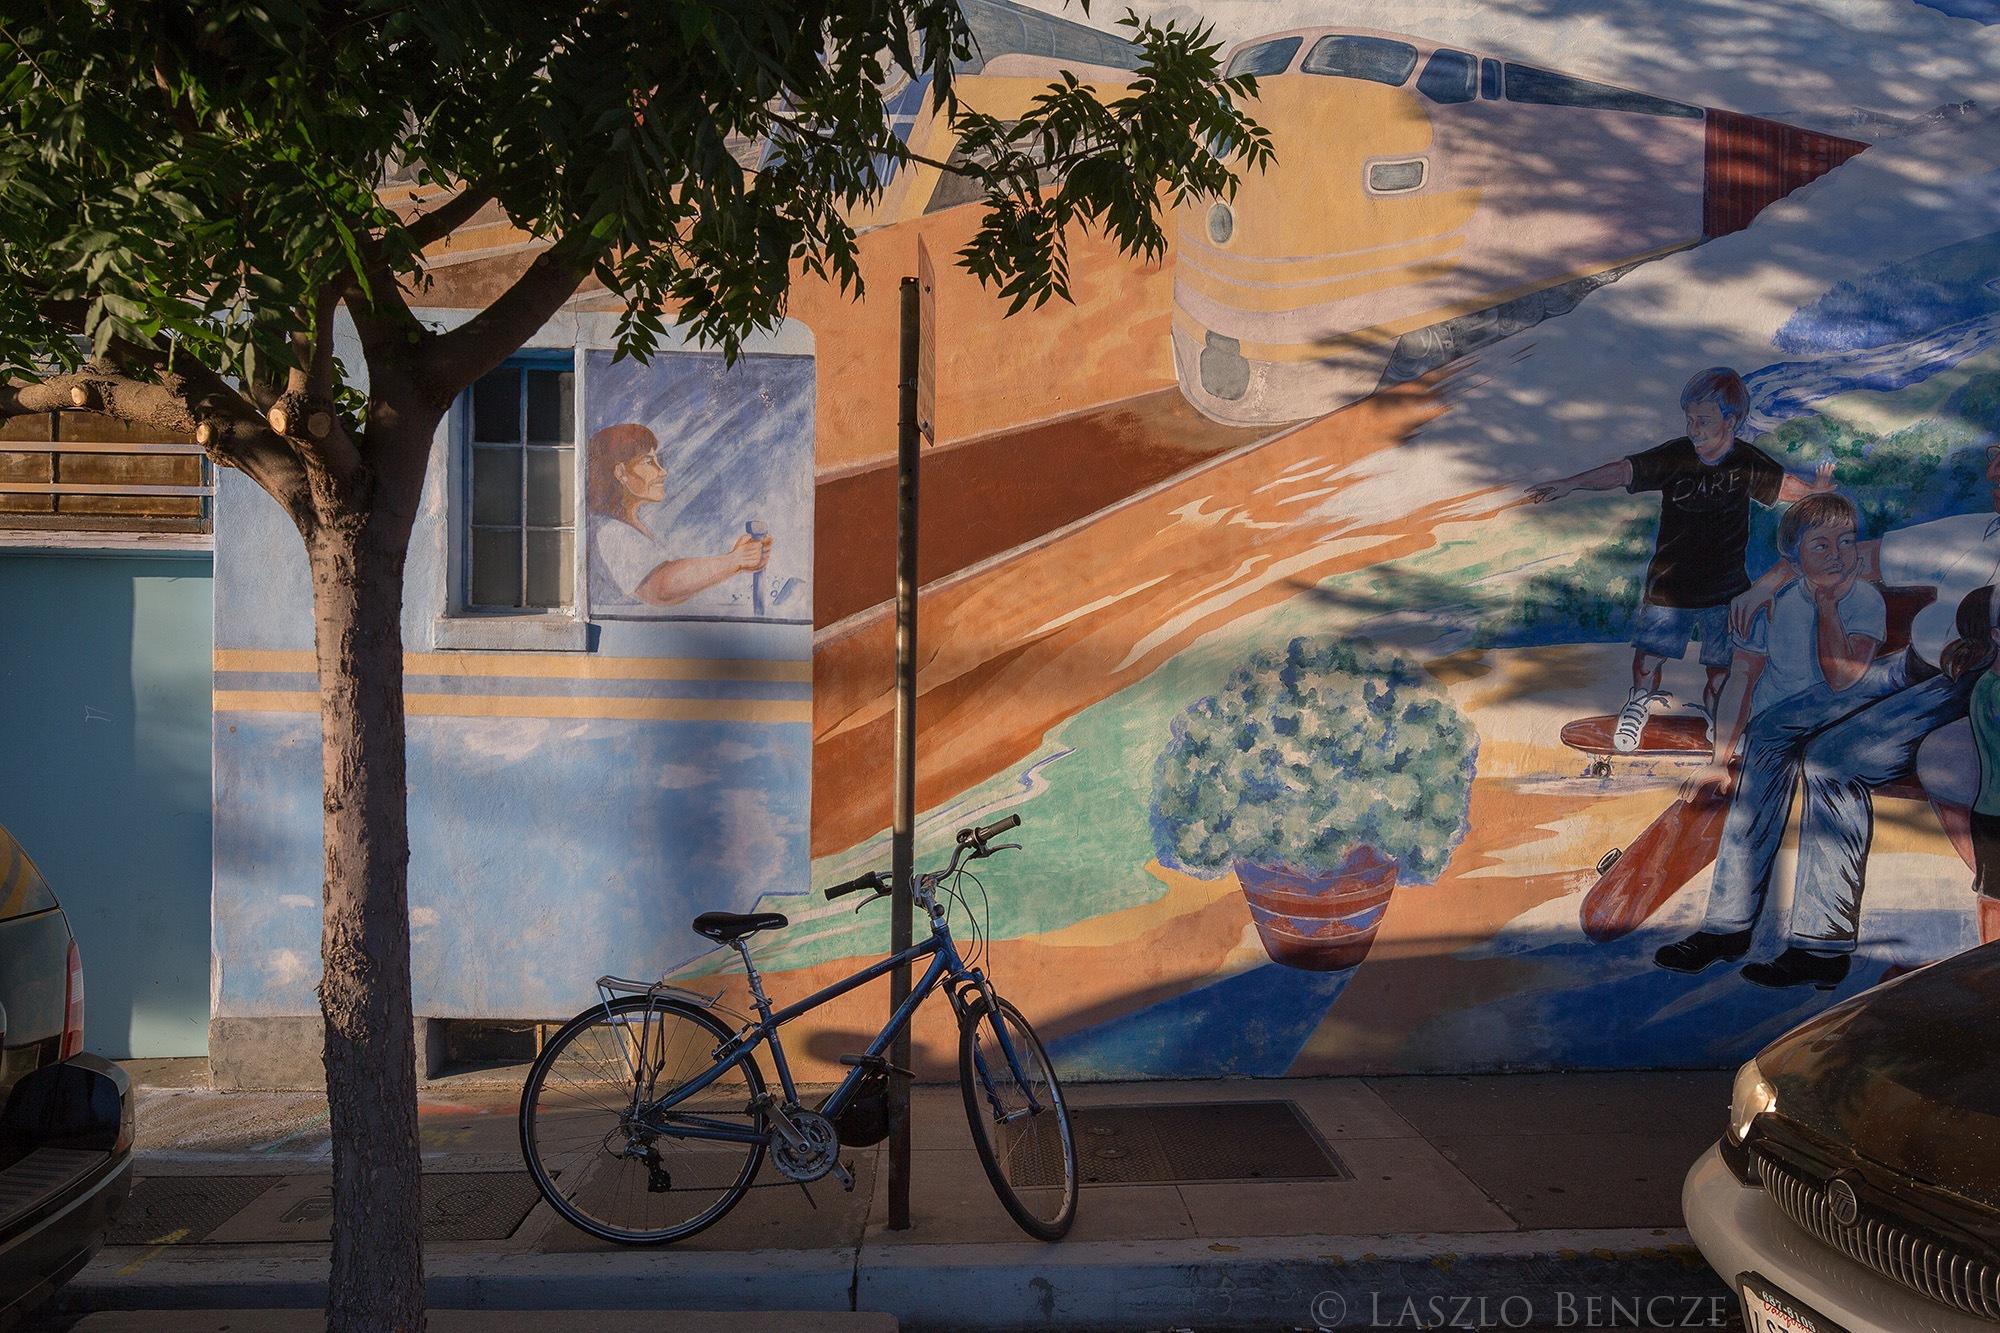 Roseville Wall Art by Laszlo Bencze